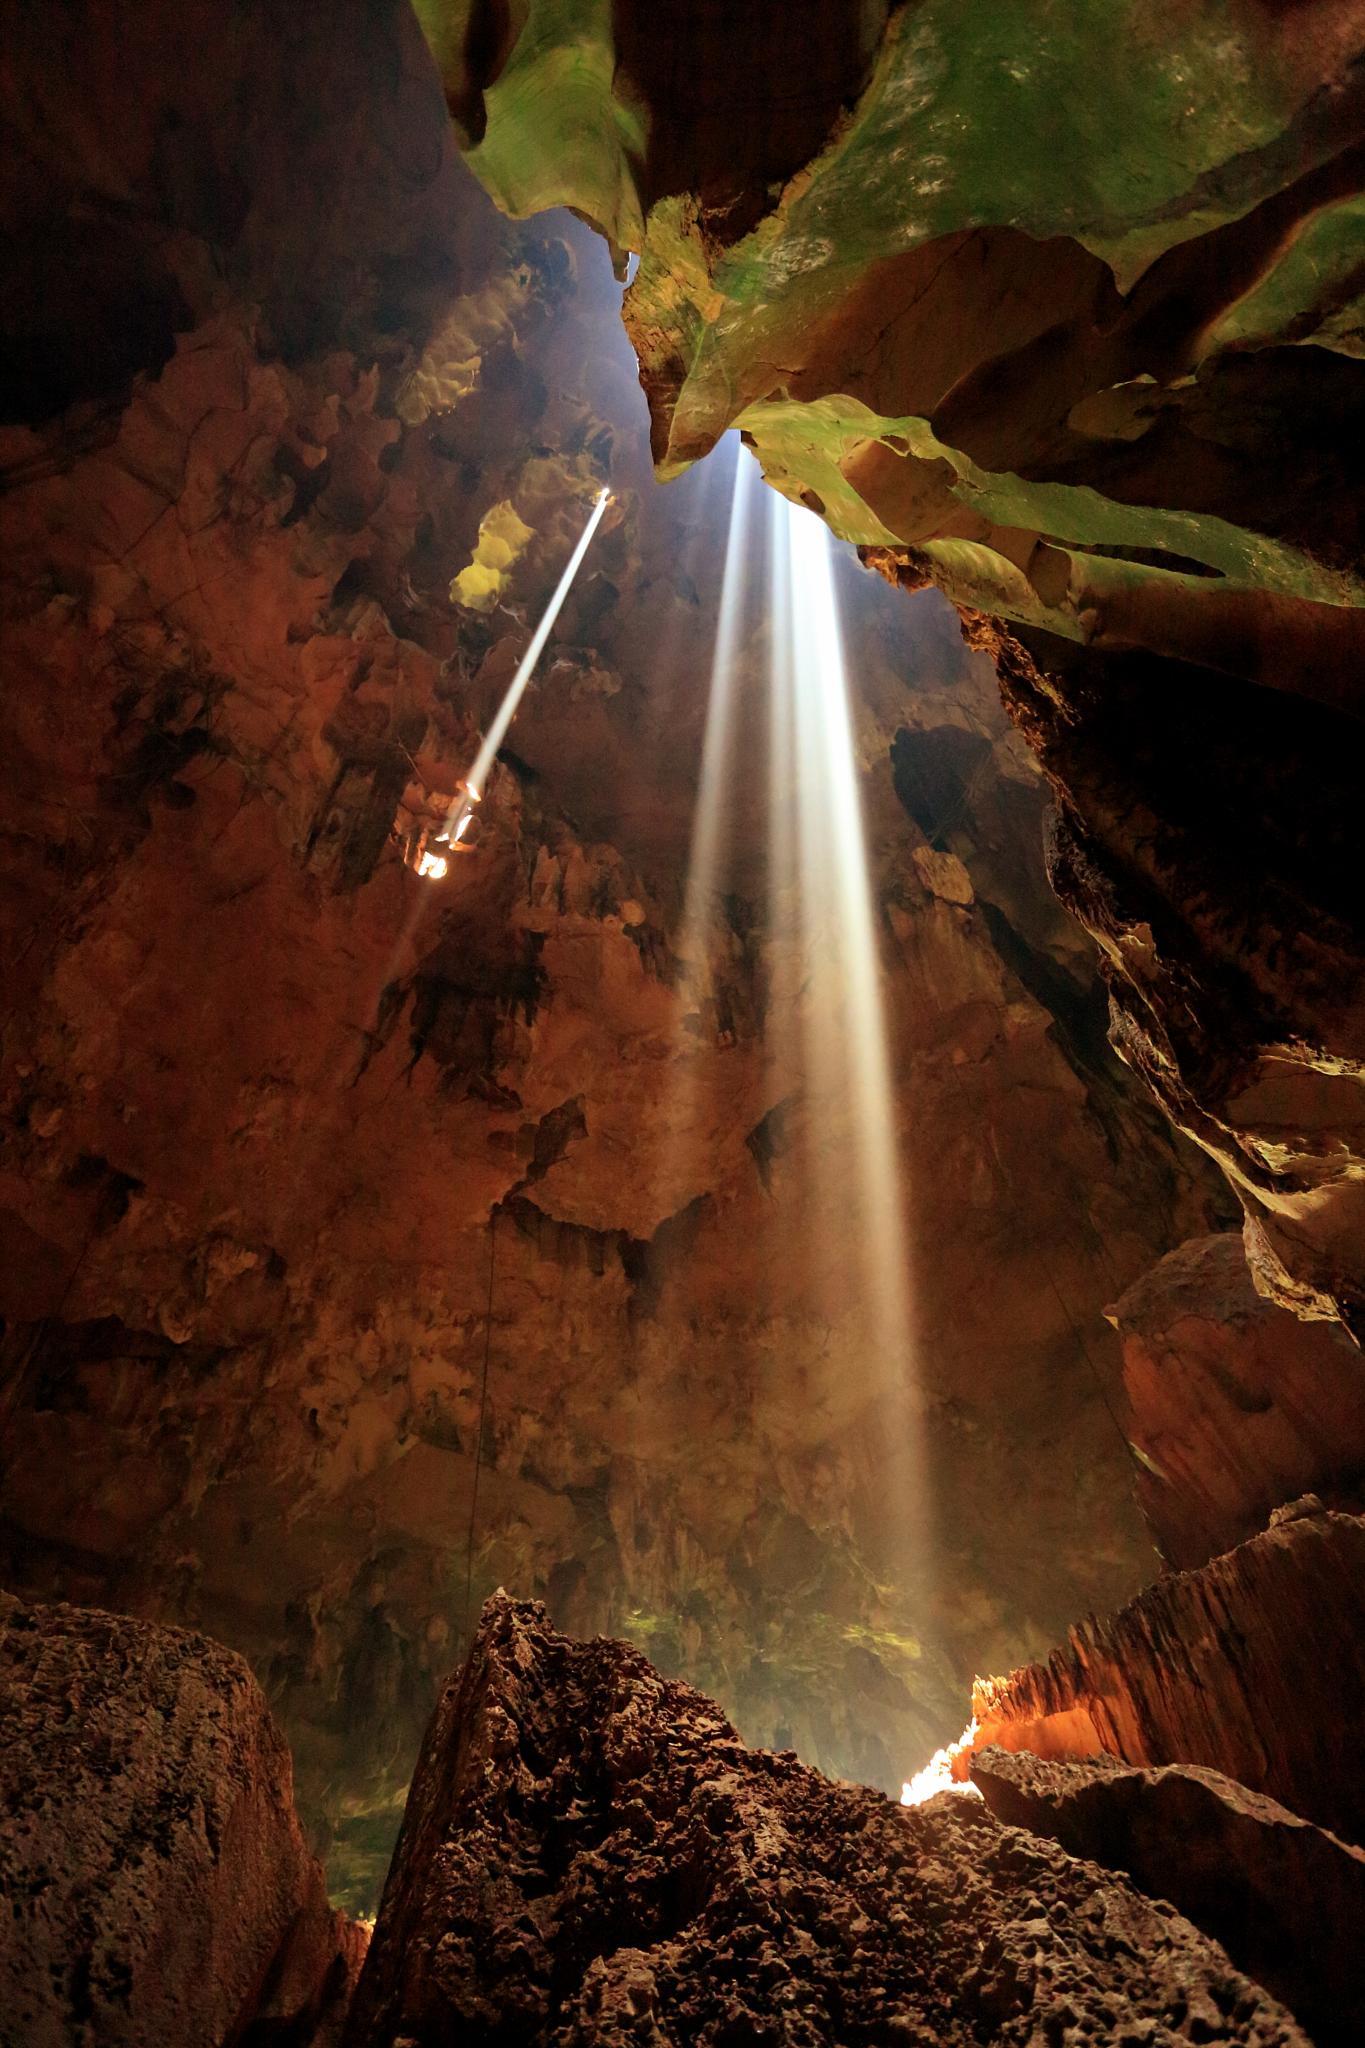 Light of Nature by Burhanuddin